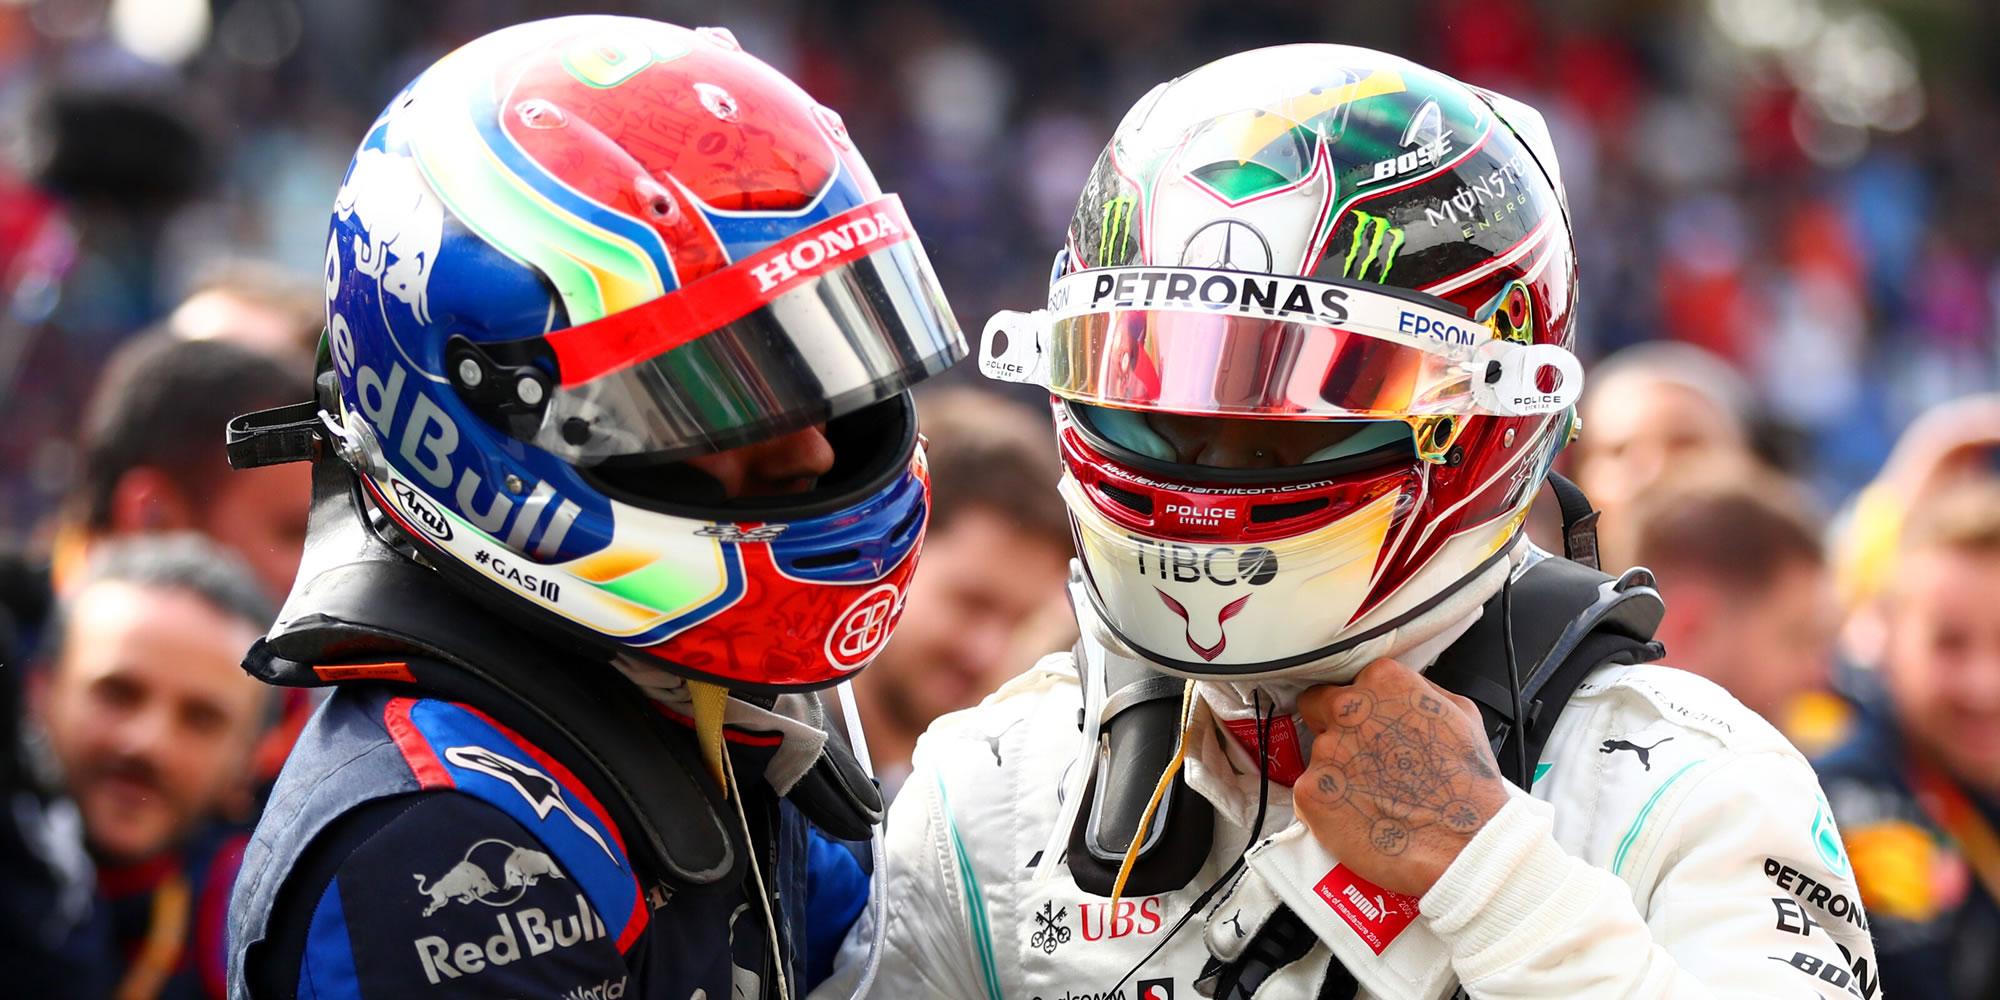 Brazil GP 2019 – Podium! 19